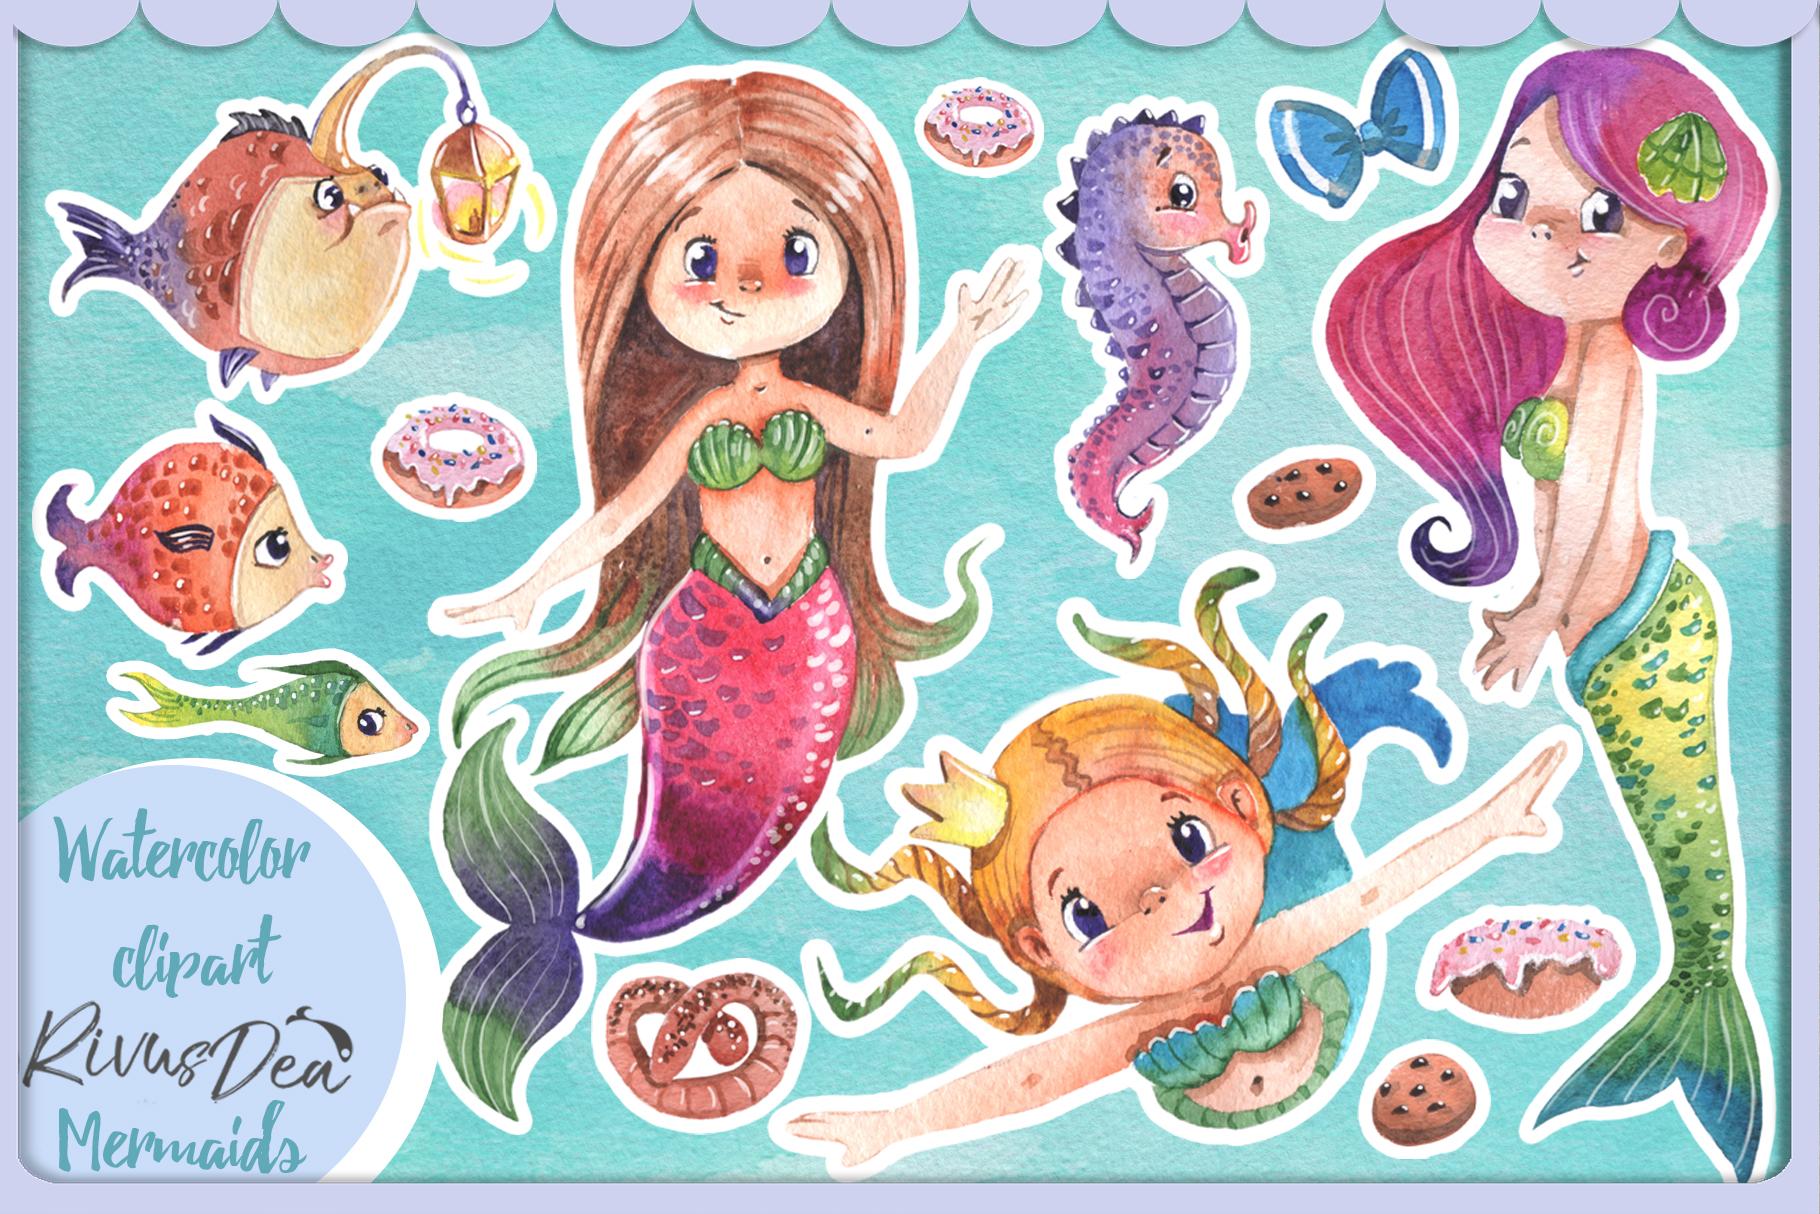 Watercolor mermaid clipart vector library Watercolor mermaid clipart set vector library